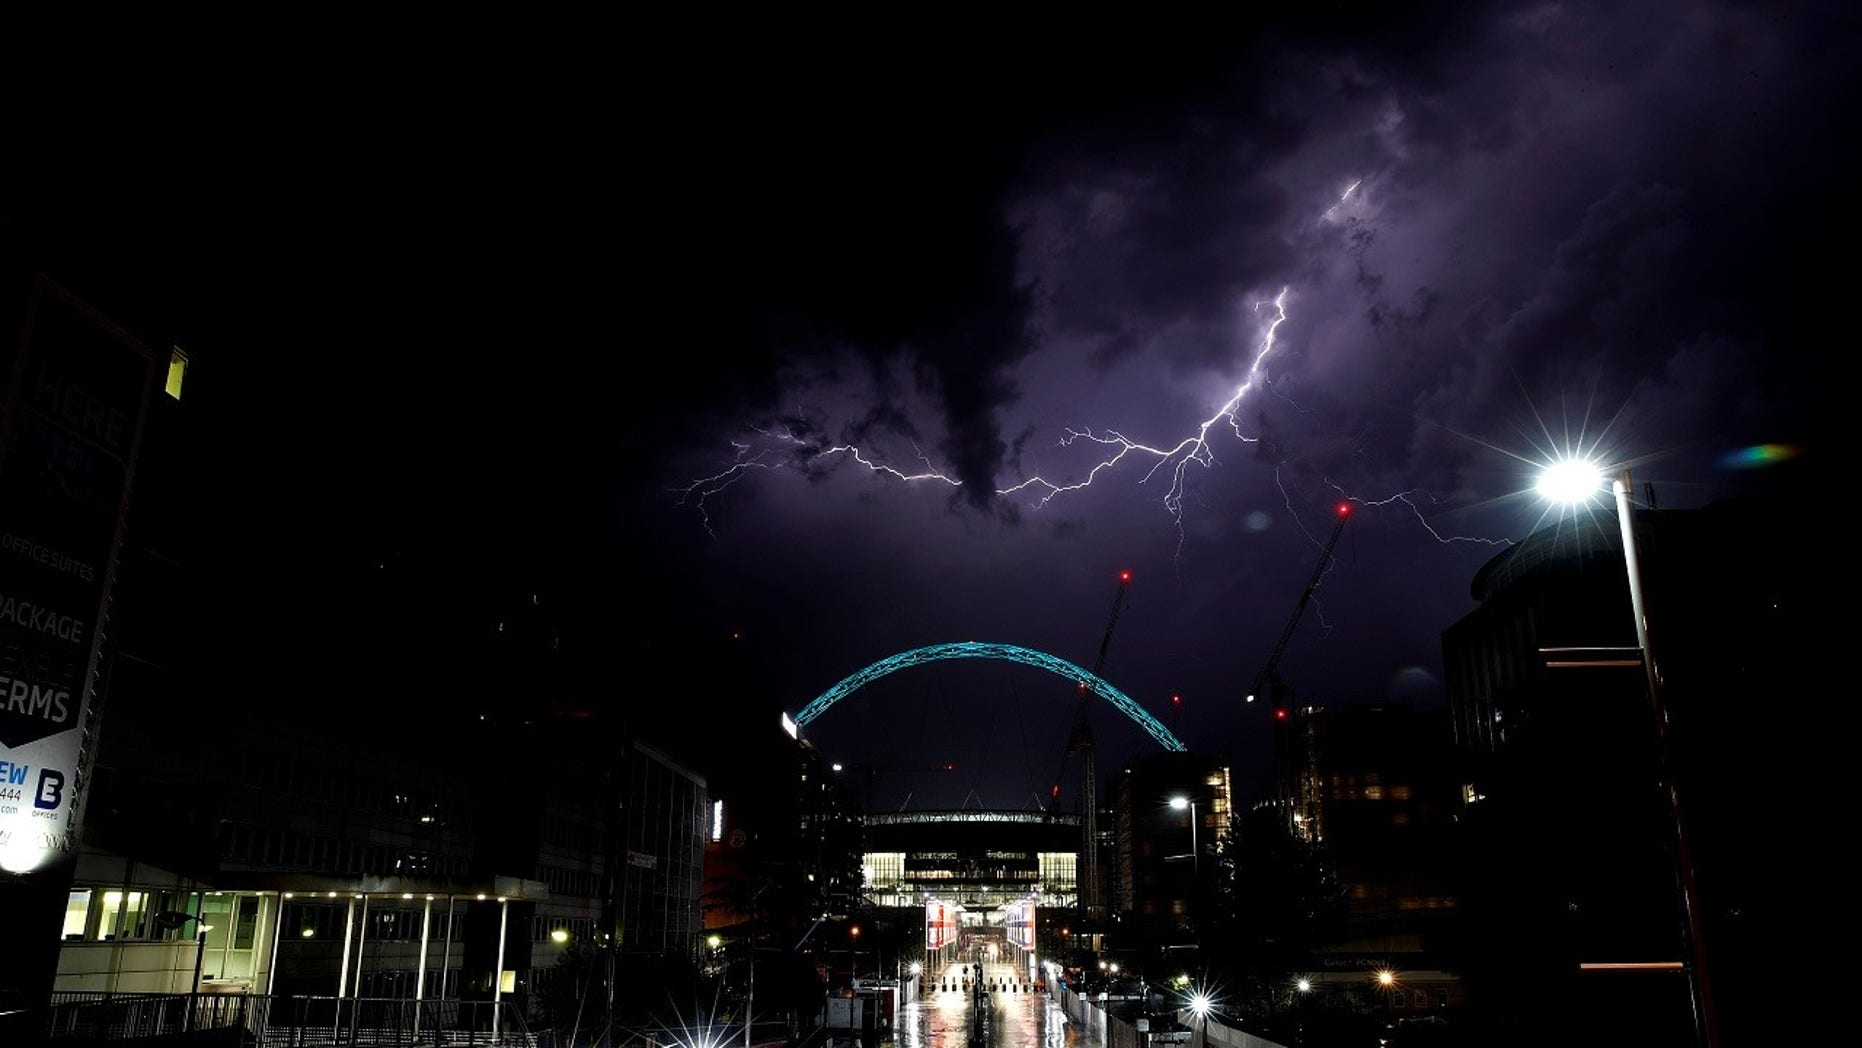 Lightning strikes above Wembley Stadium in London.